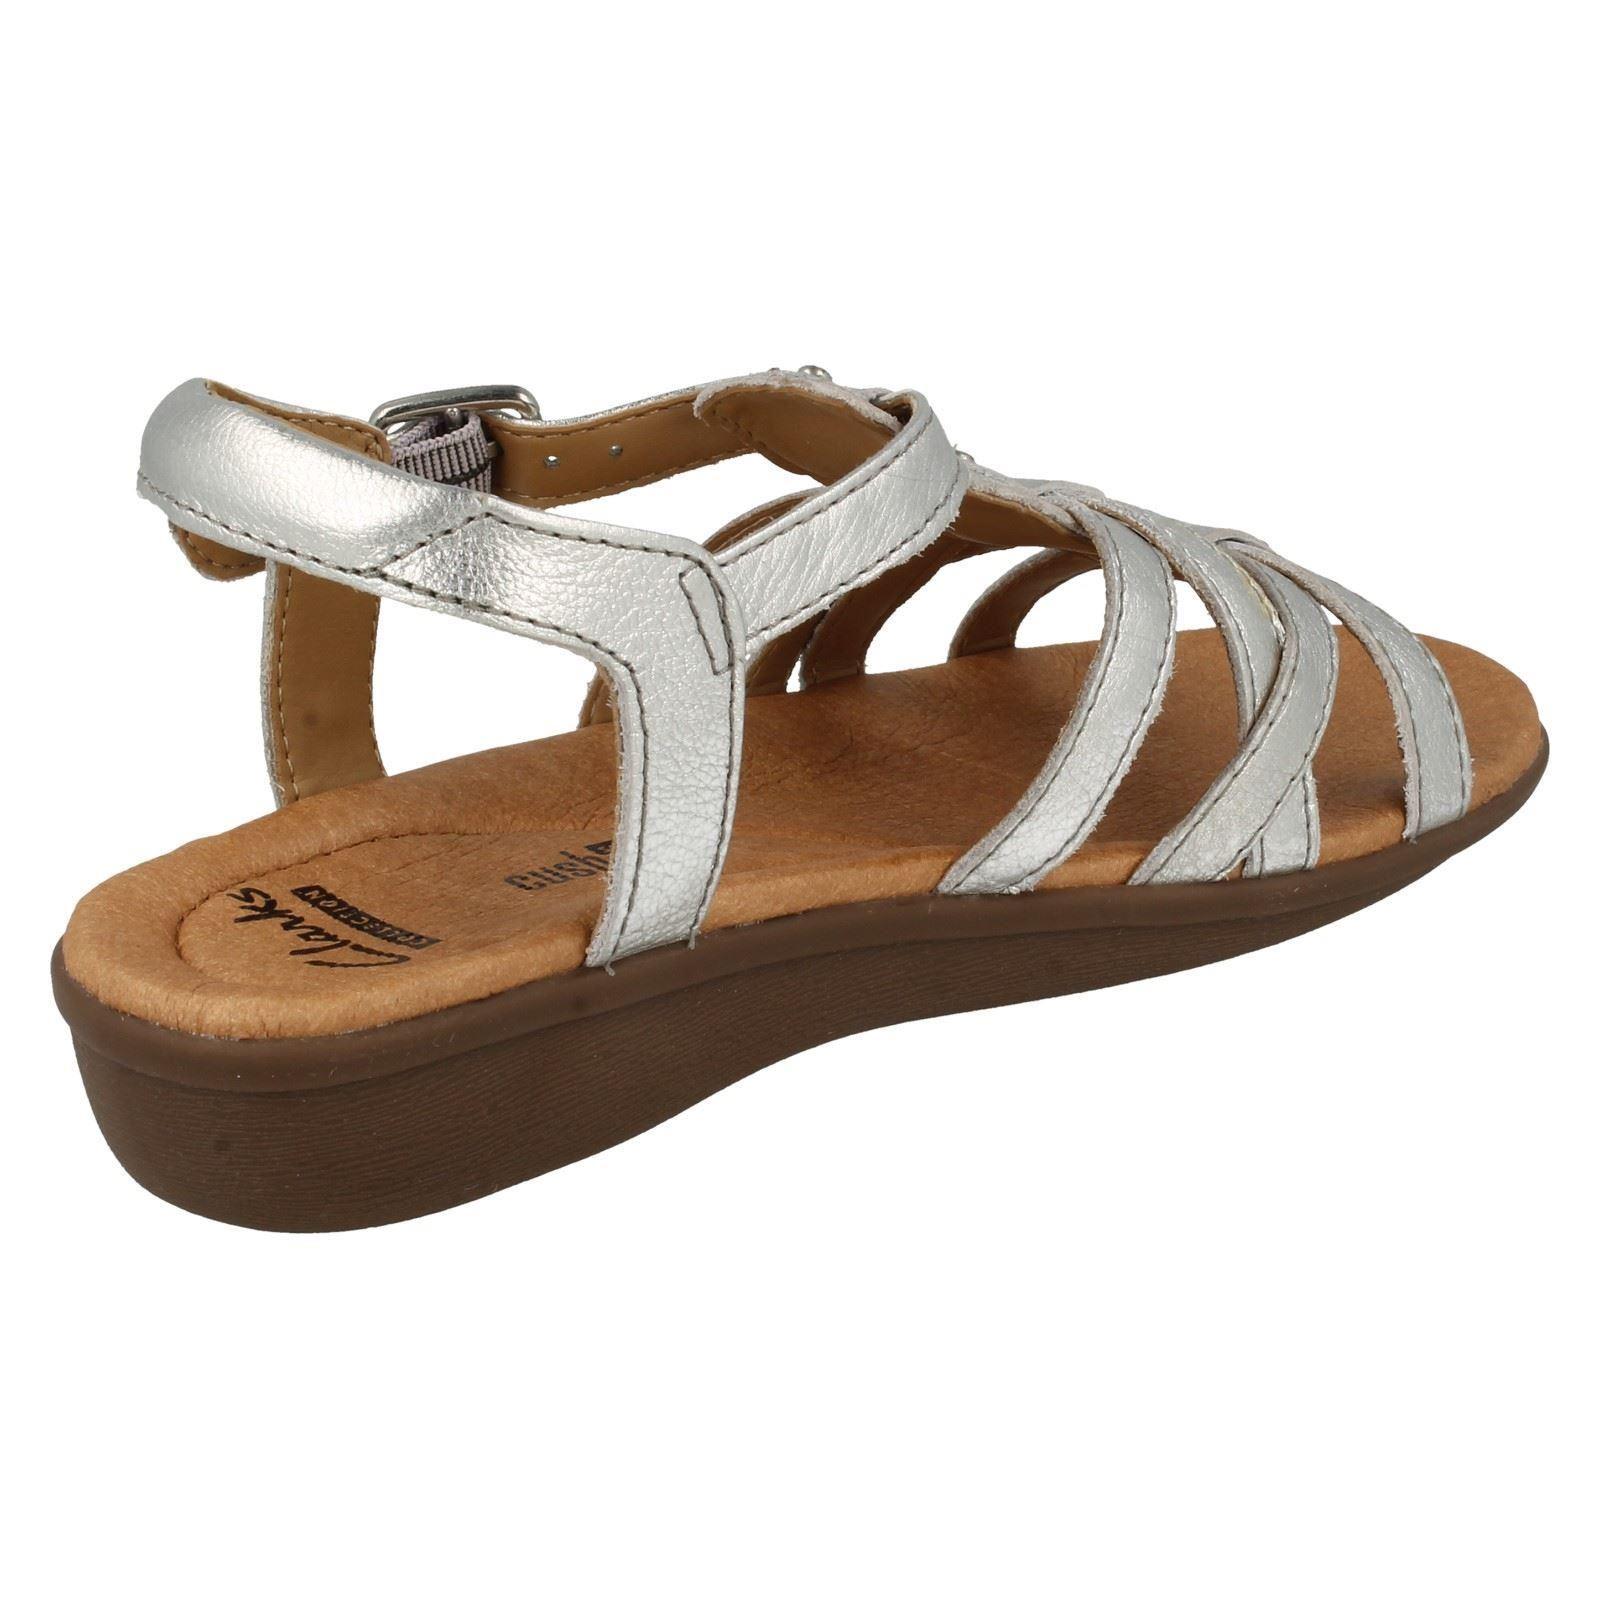 a5485f09d9f5 Womens-Clarks-Gladiator-Style-Sandals-Manilla-Bonita thumbnail 27